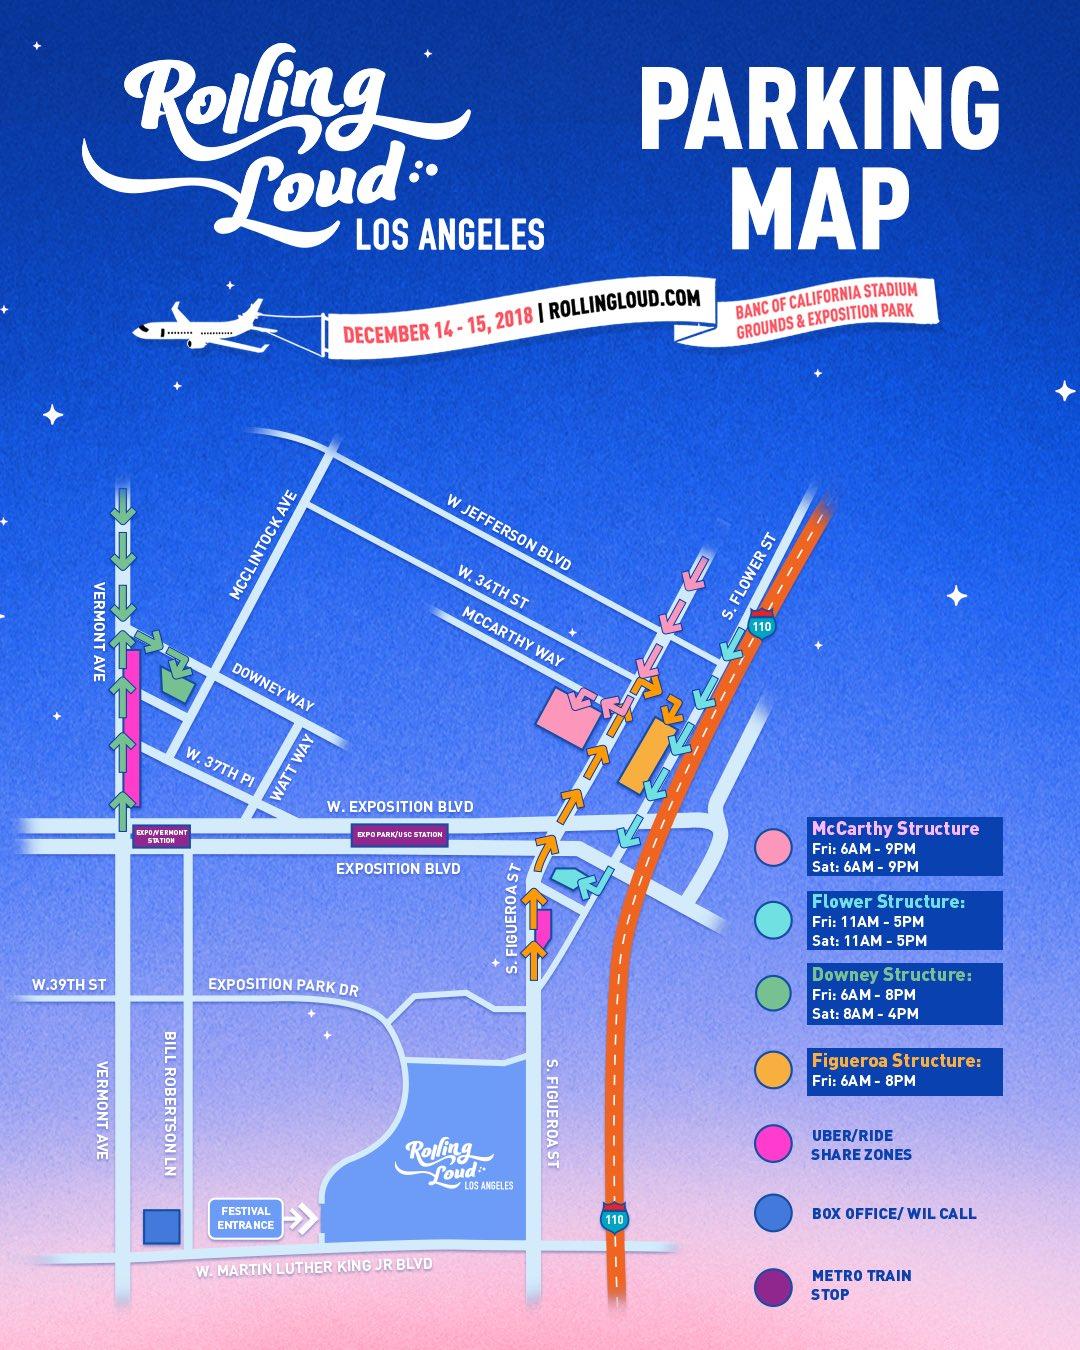 RL18 LA - Parking Map.jpg